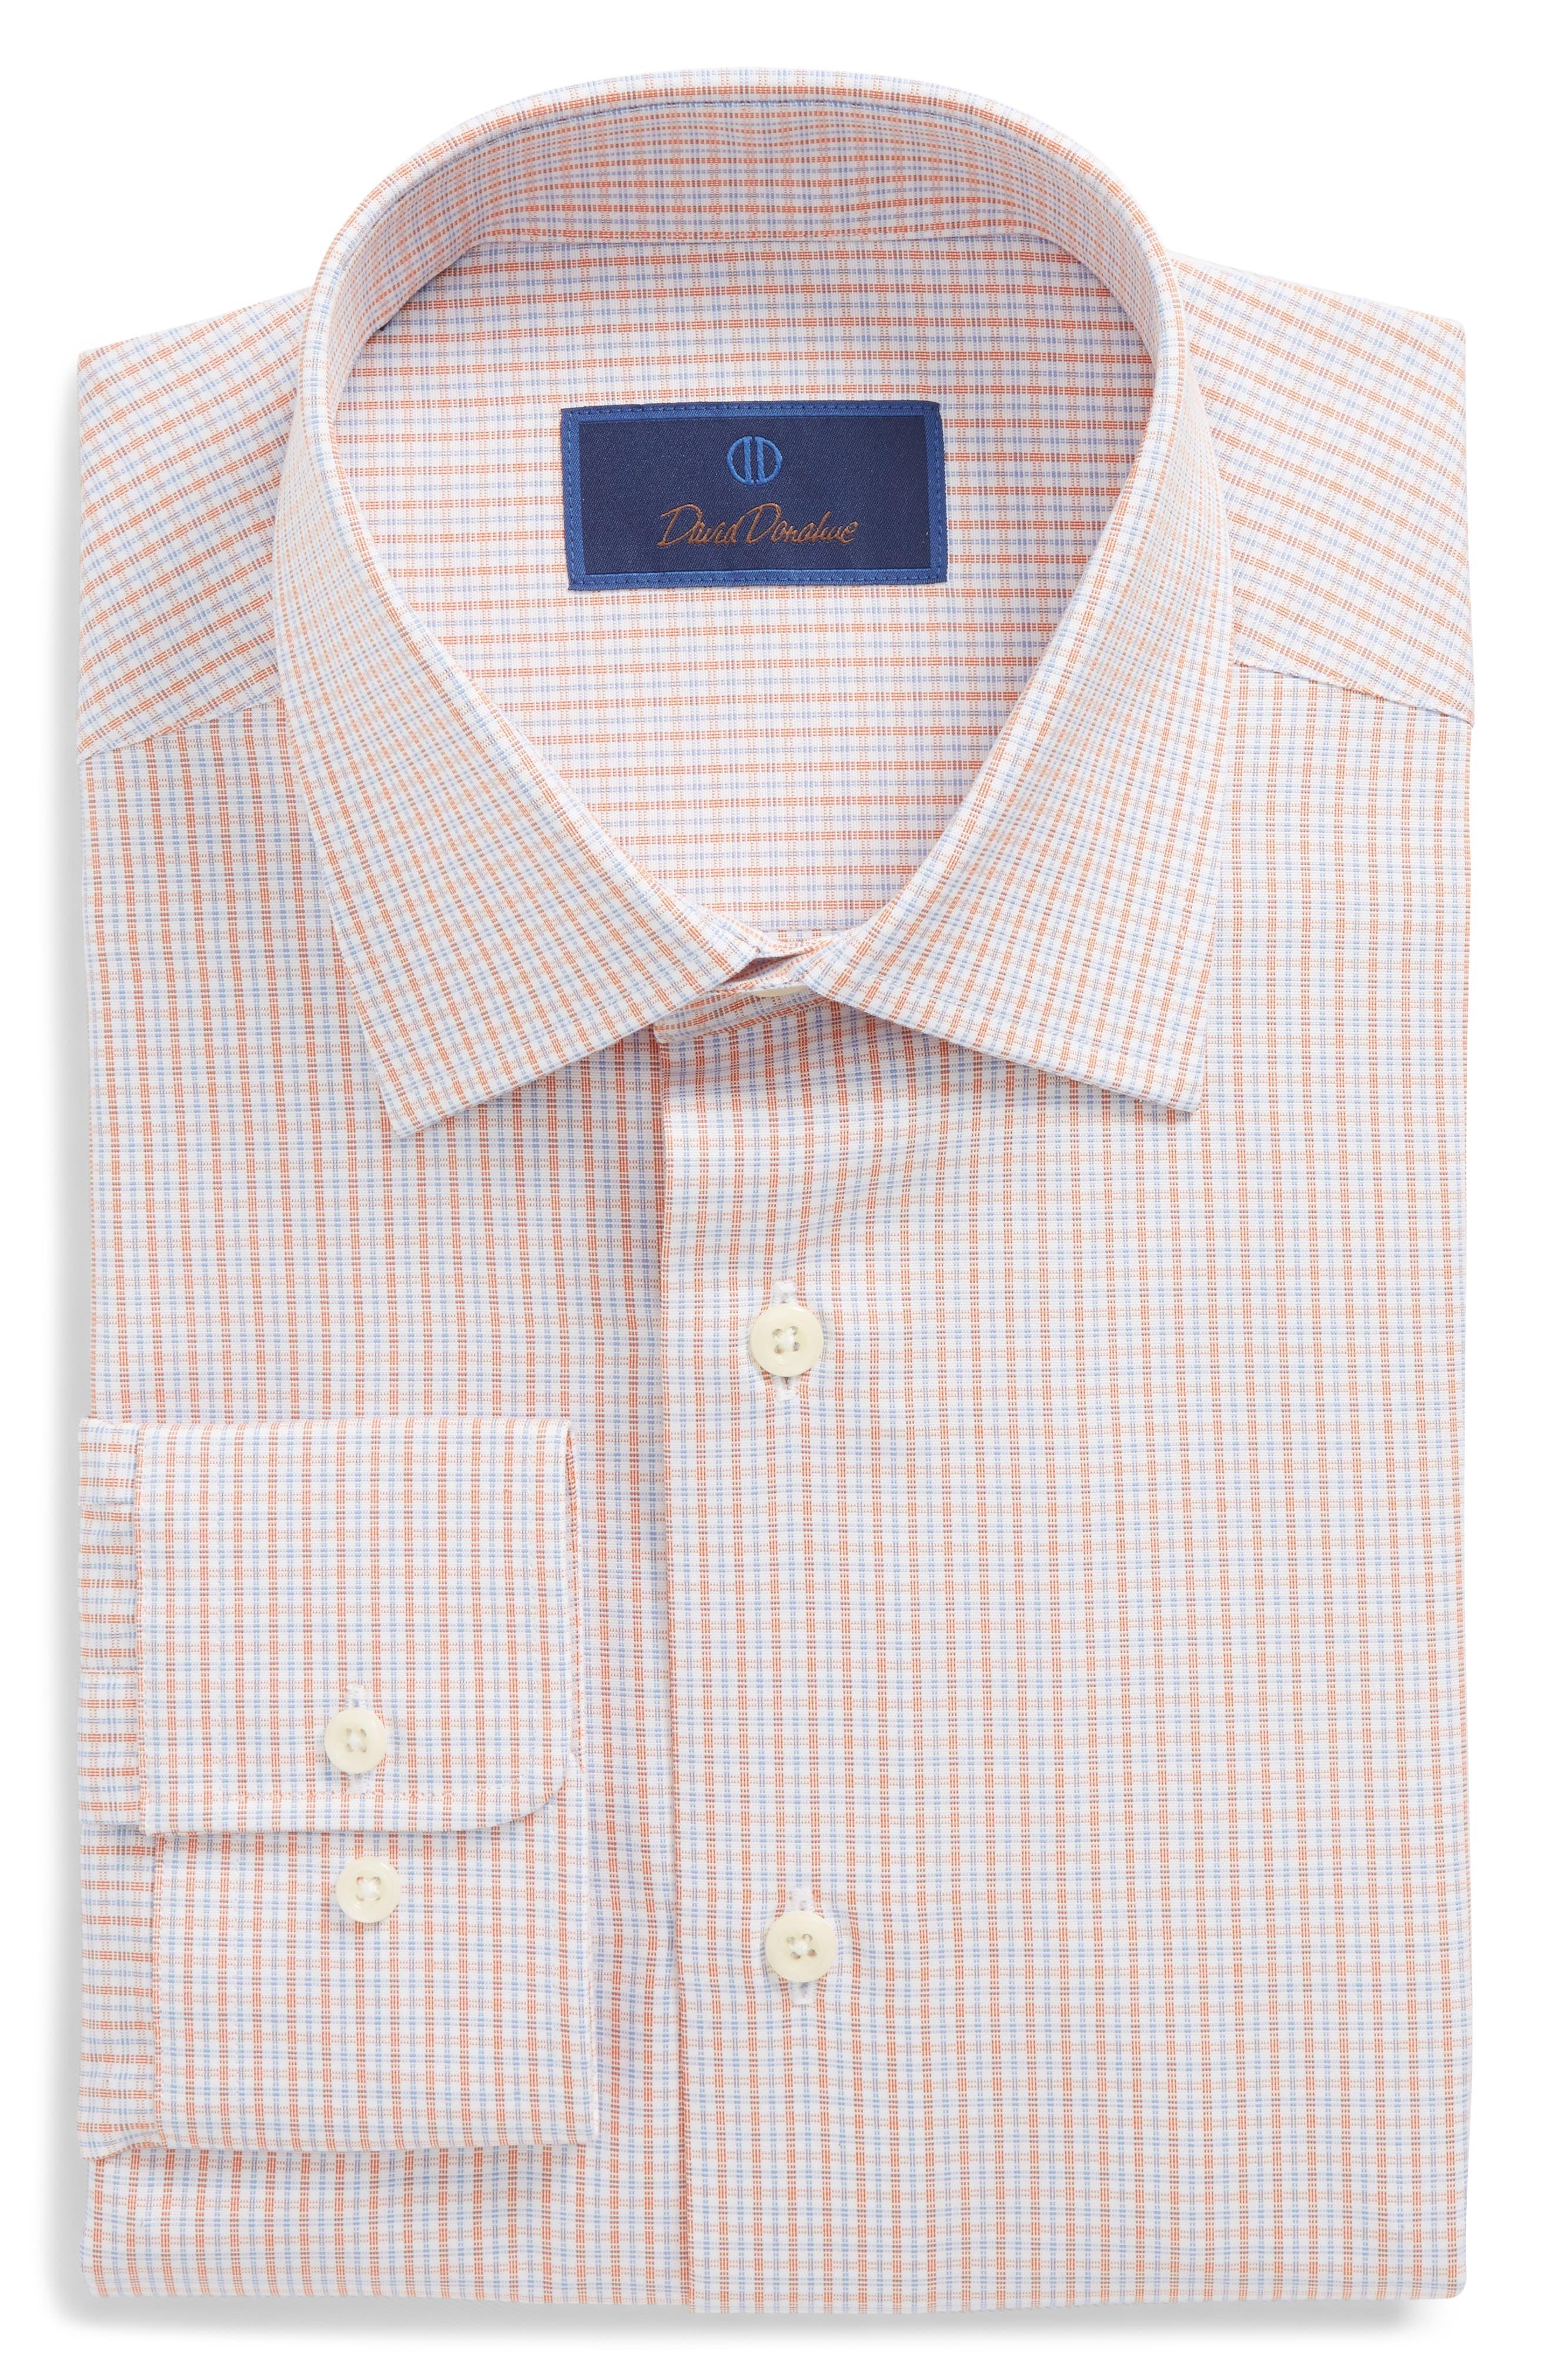 Regular Fit Check Dress Shirt,                         Main,                         color, 830